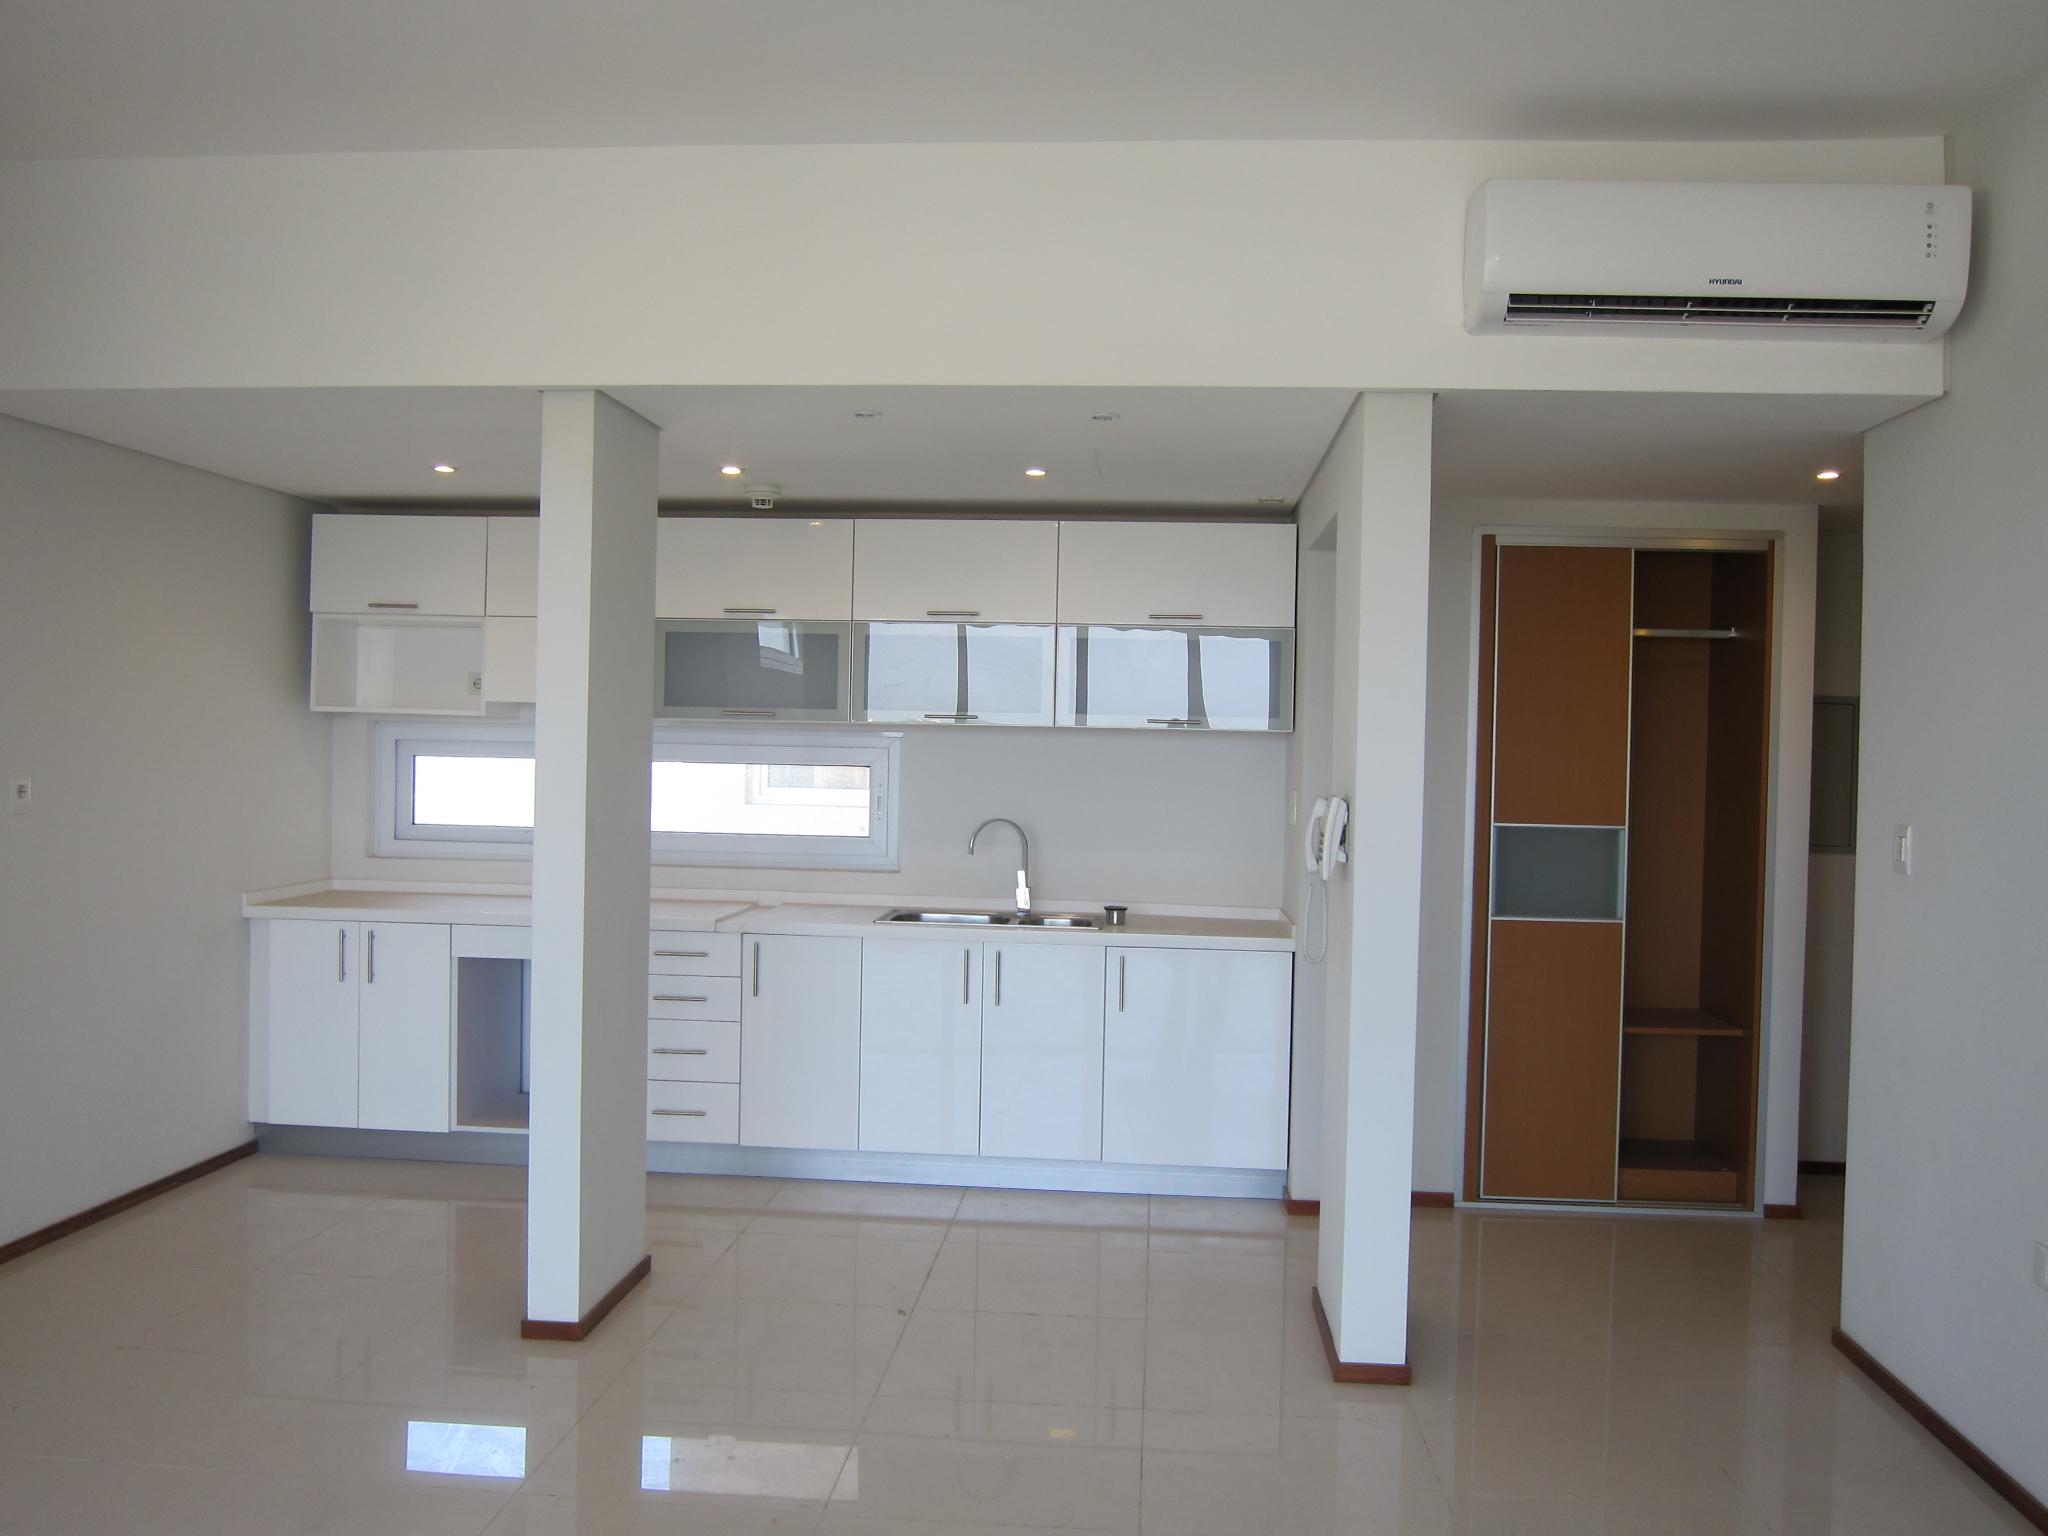 Alquilo Departamento De Dos Dormitorios Sobre Avda. Santa Teresa